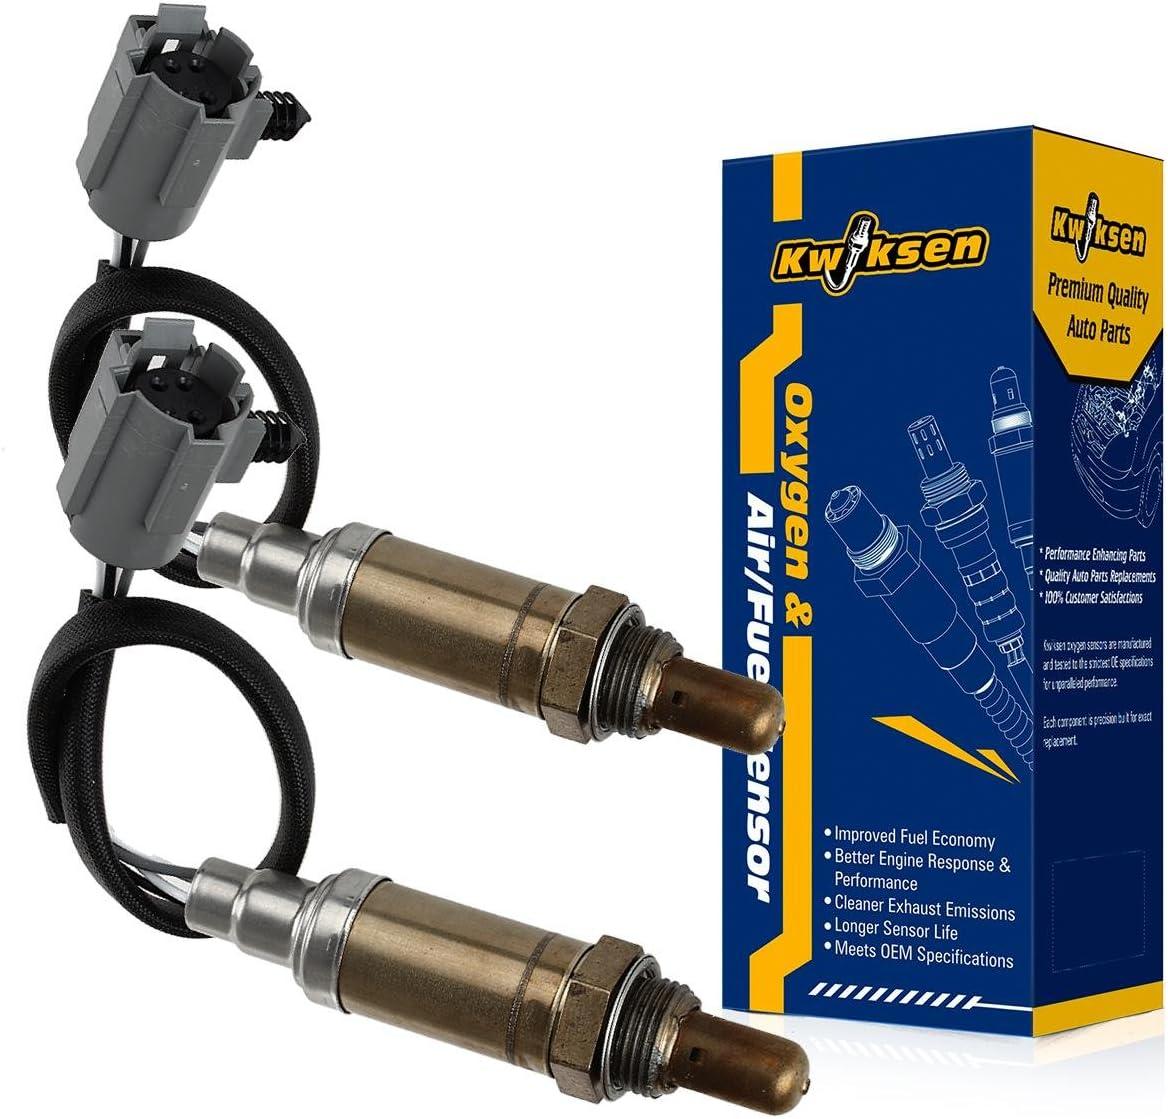 2x Upstream /&Downstream O2 Oxygen Sensor for 97-99 Dodge Ram 1500 2500 3500 5.2L